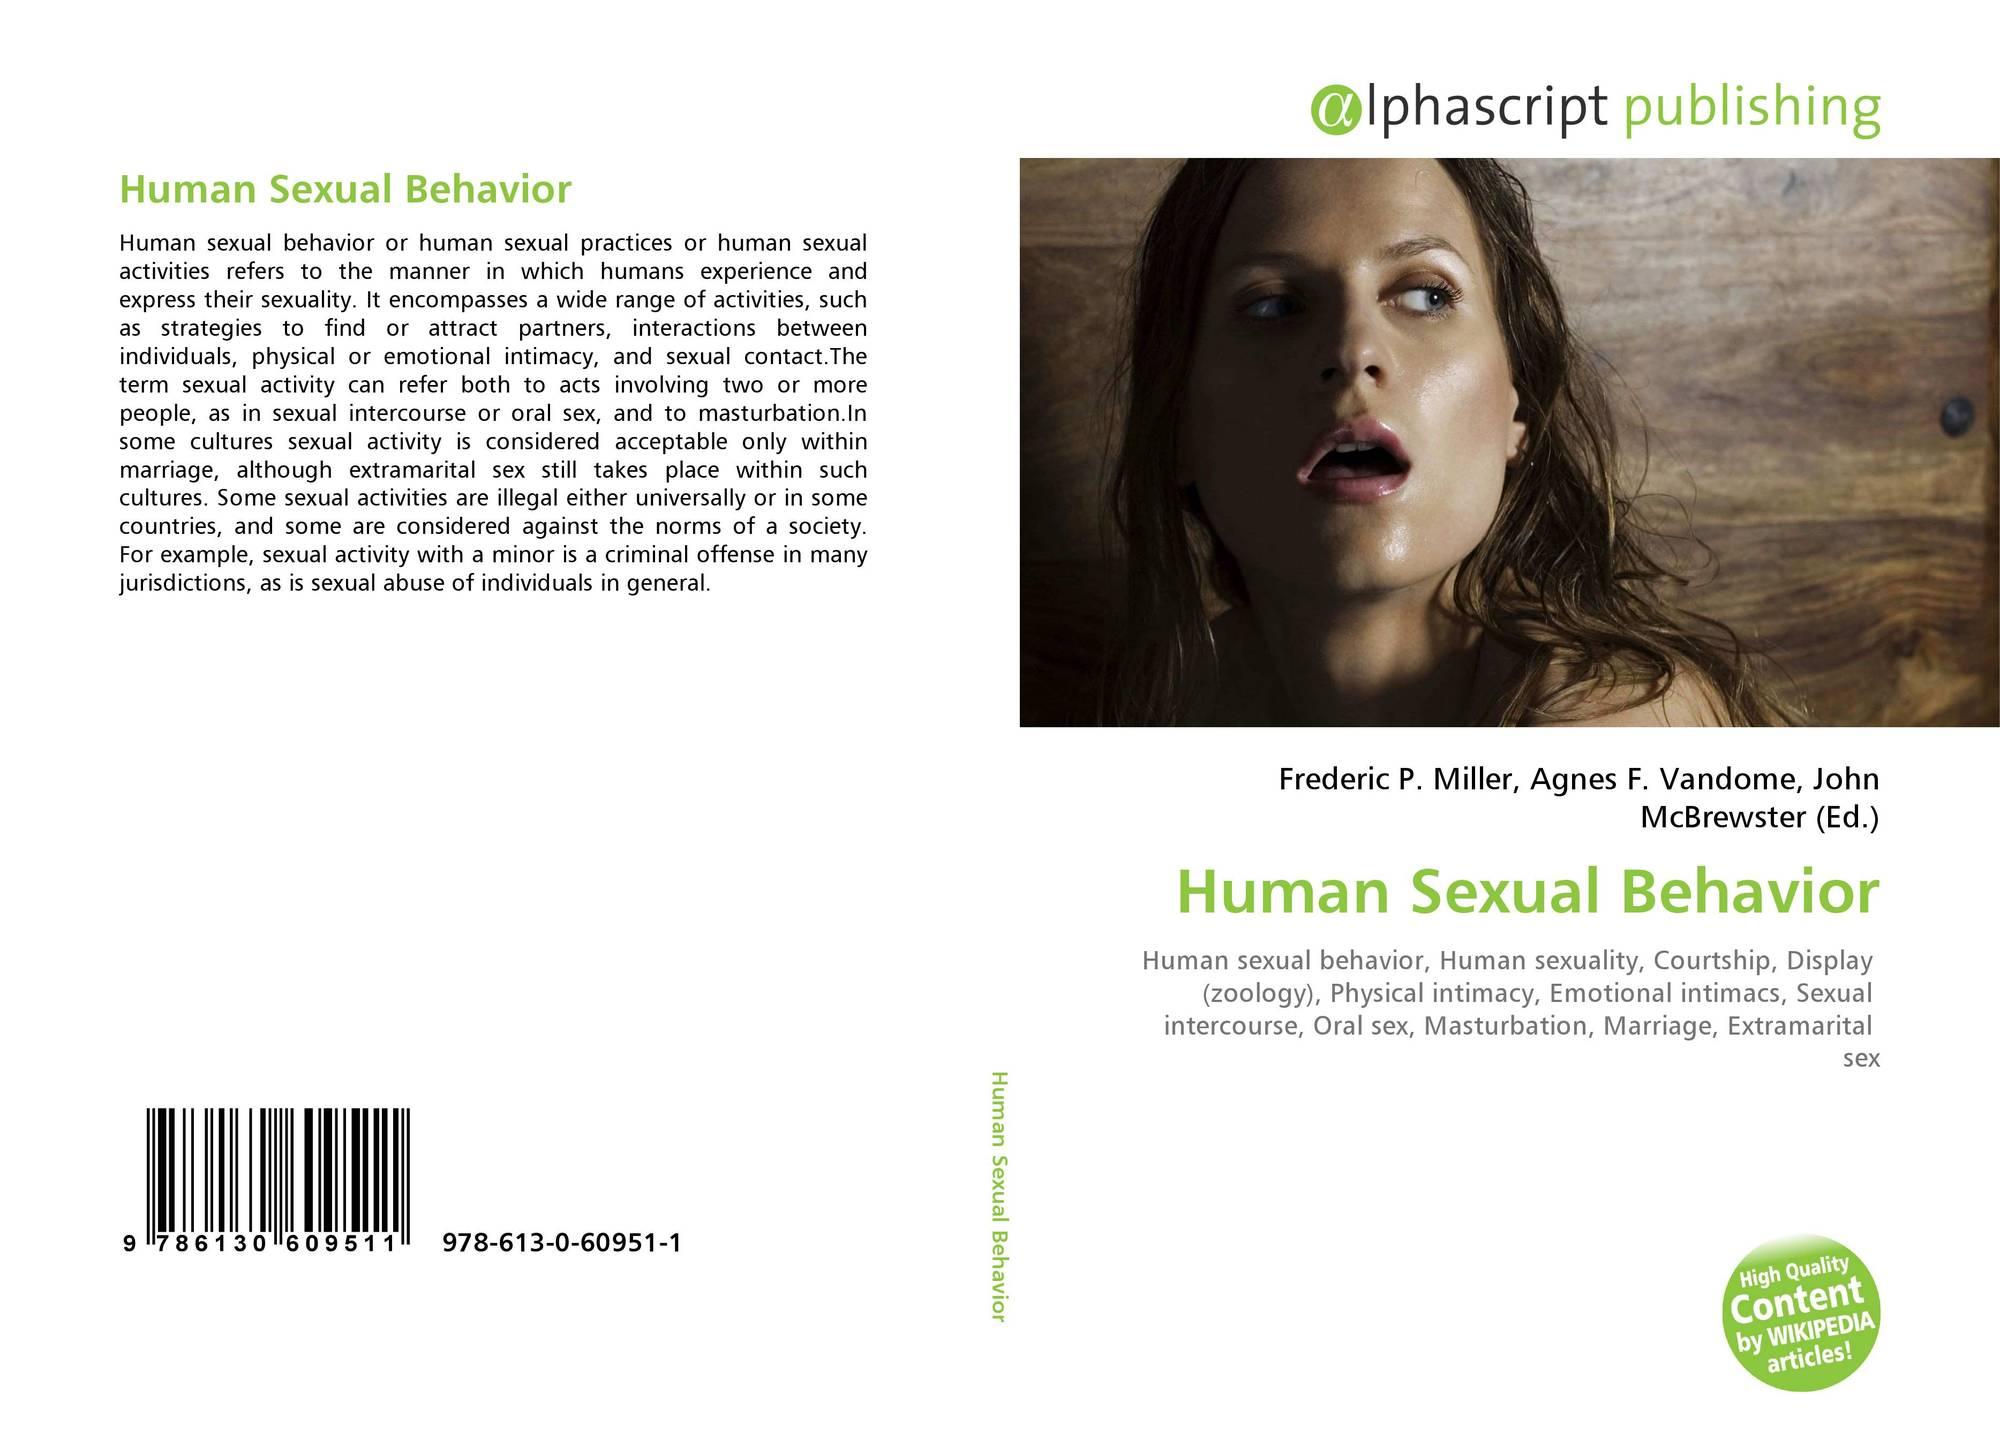 Human sexuality and behavior